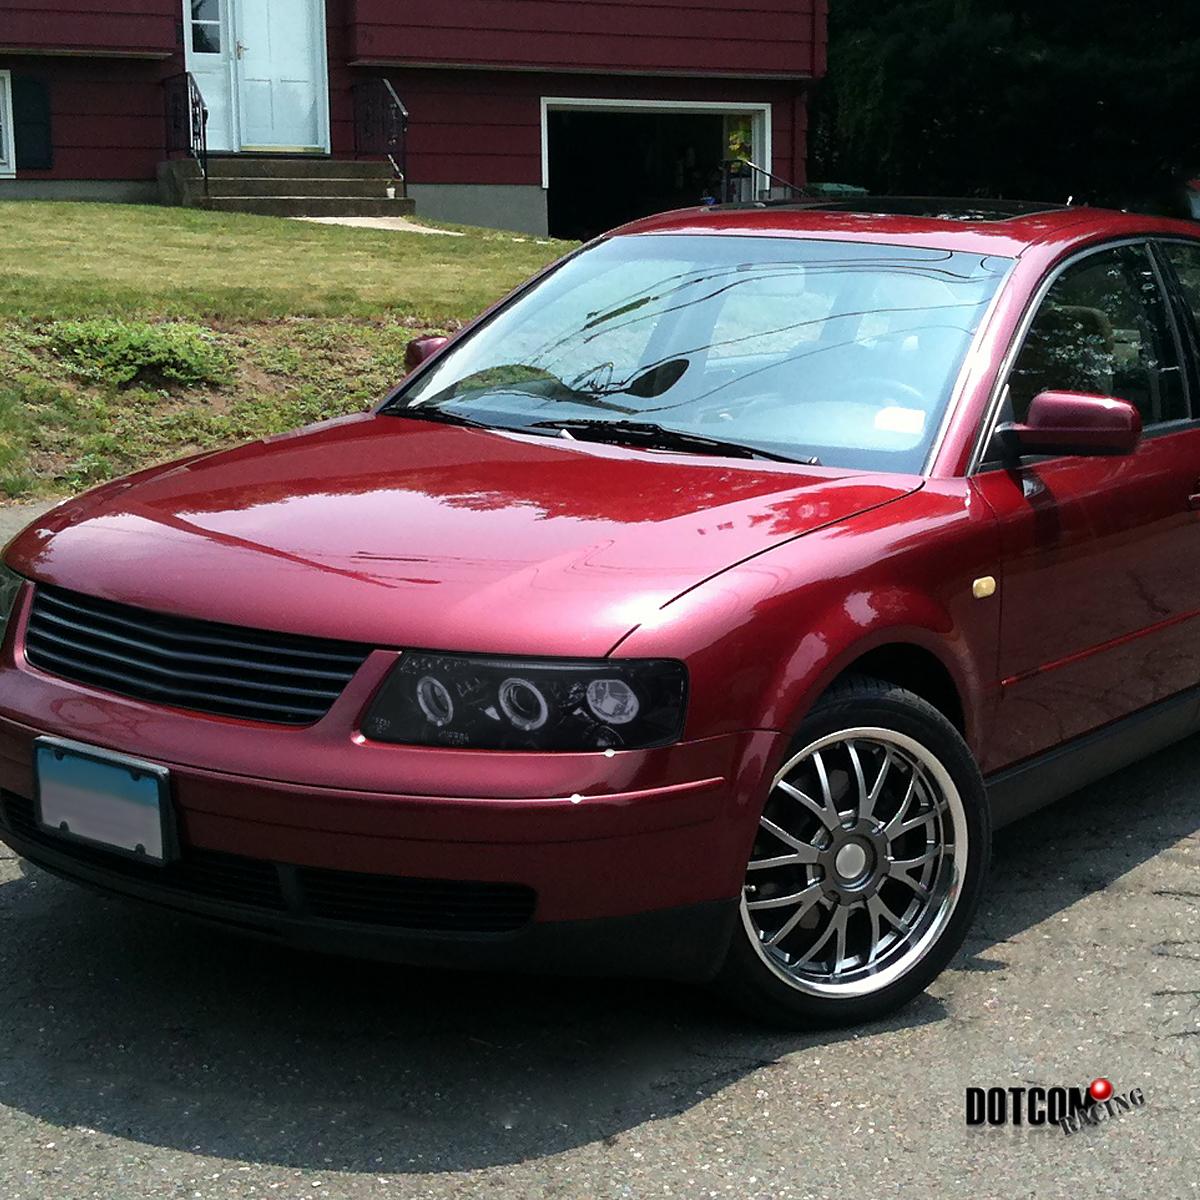 Black Smoke Fit 1997-2000 VW Passat B5 LED Halo Projector Headlights Pair